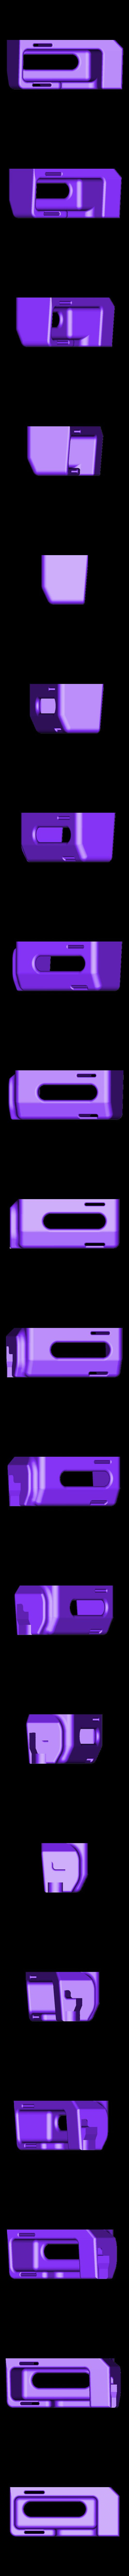 Nano_Drak_GP8_TEST.stl Descargar archivo STL Ritewing Nano Drak Print Bundle • Objeto imprimible en 3D, RobsLoco